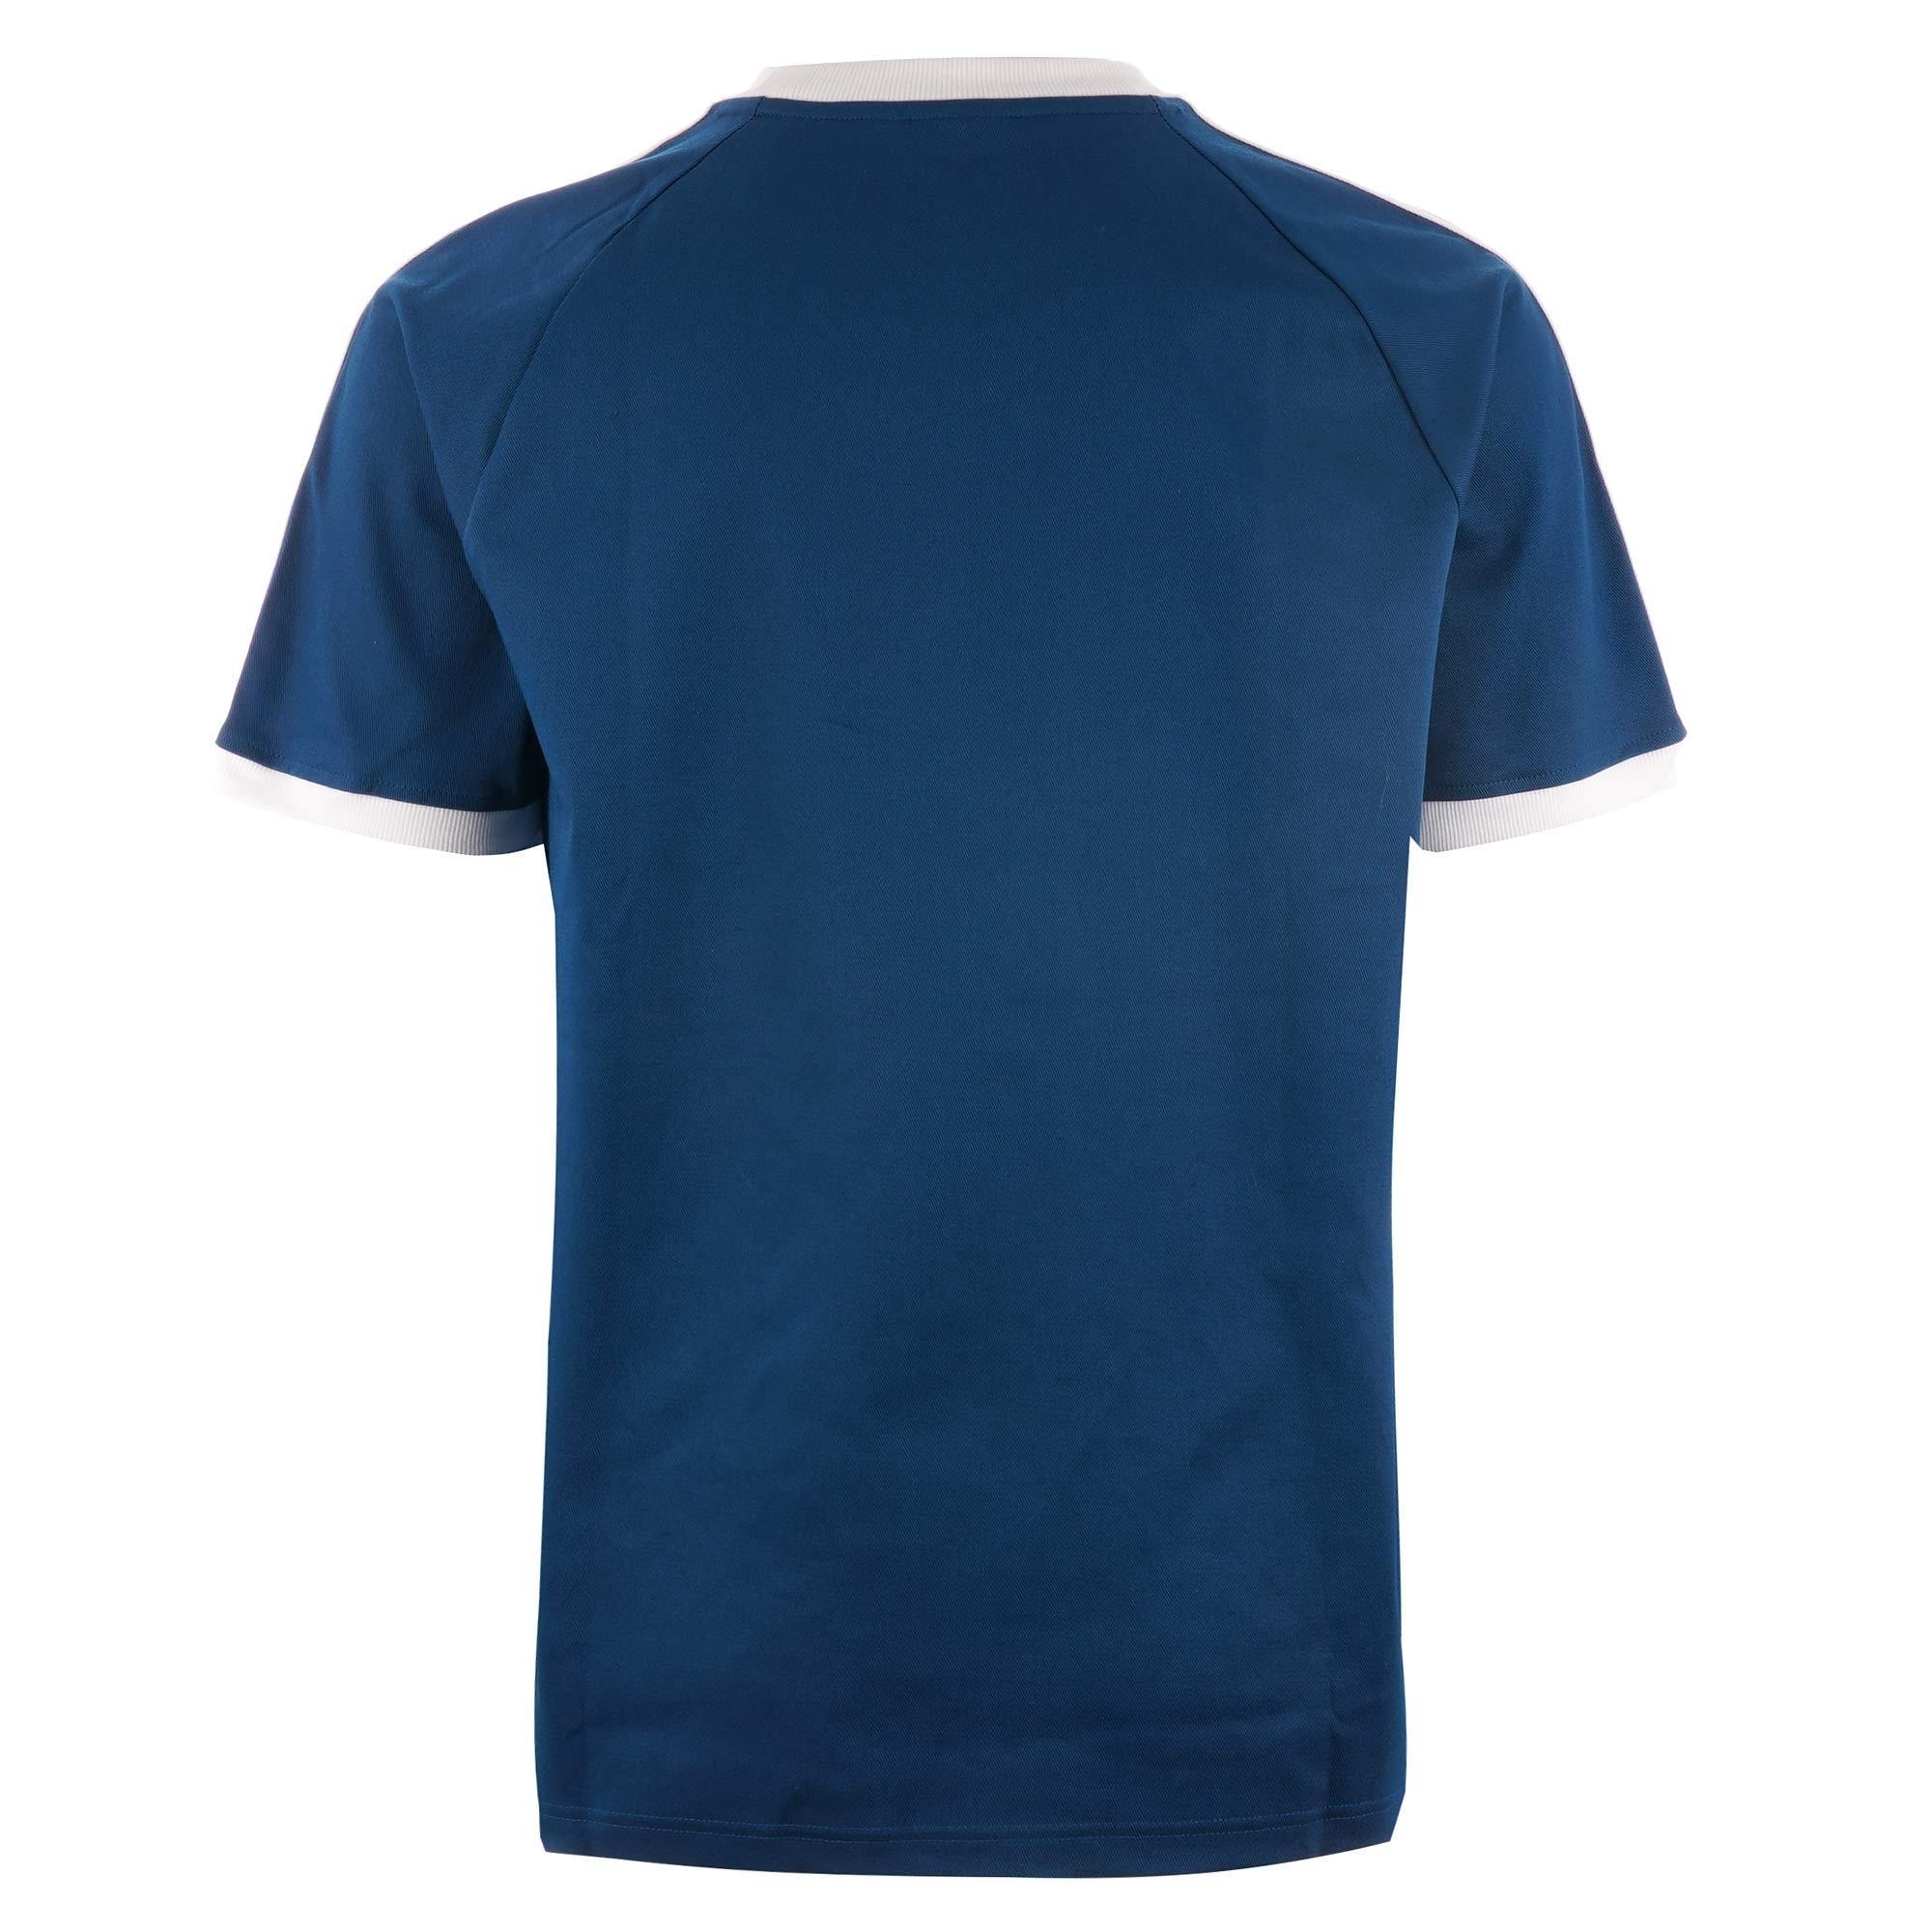 Tee whiteL shirtHombreLegend T Marine Adidas Cw JK1TFcl